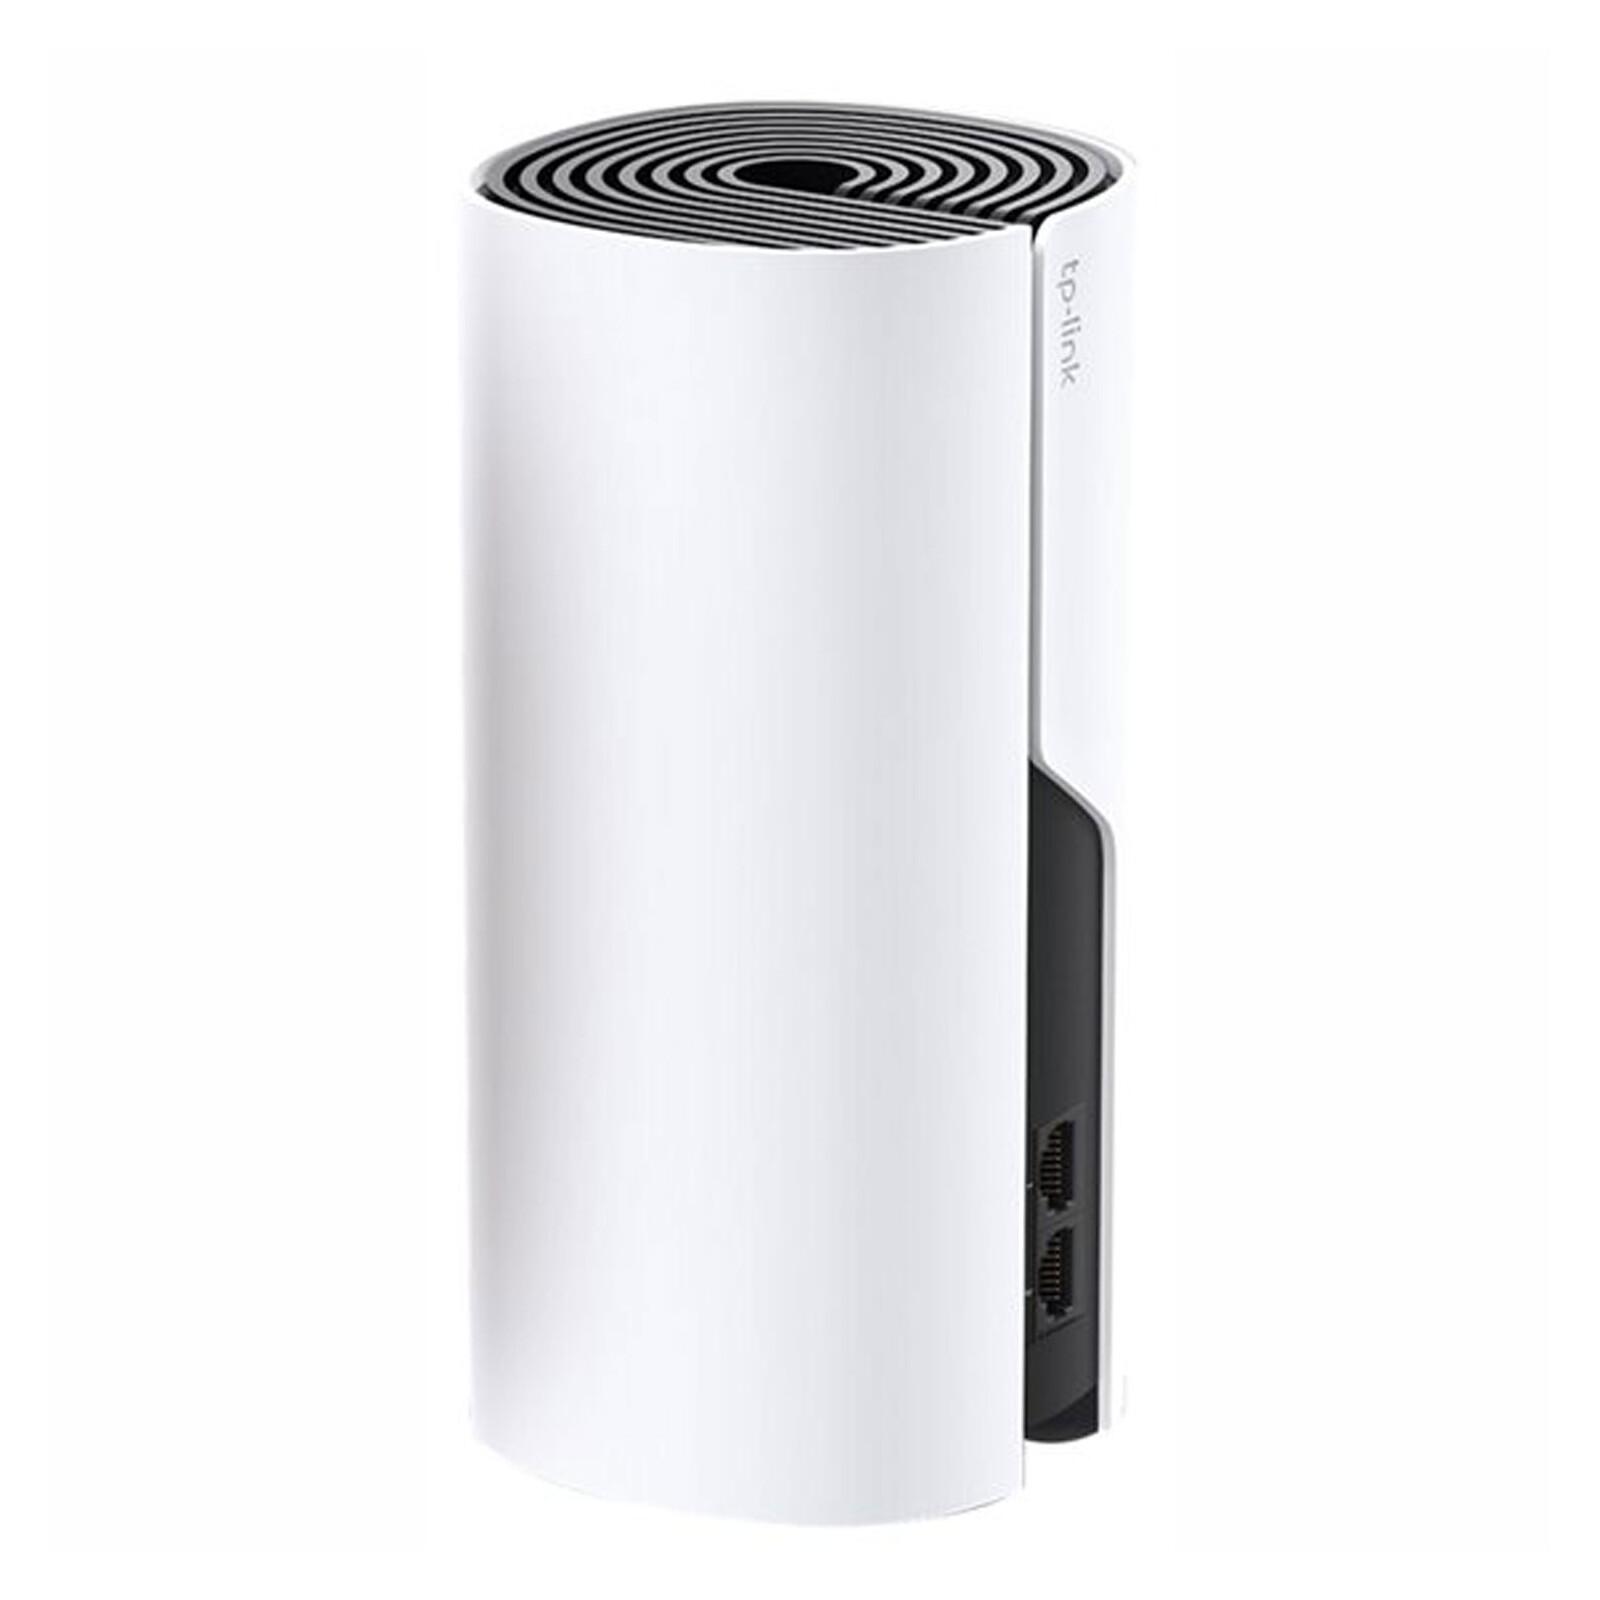 TP-Link AC1200 Whole-Home Mesh Wi-Fi Unit